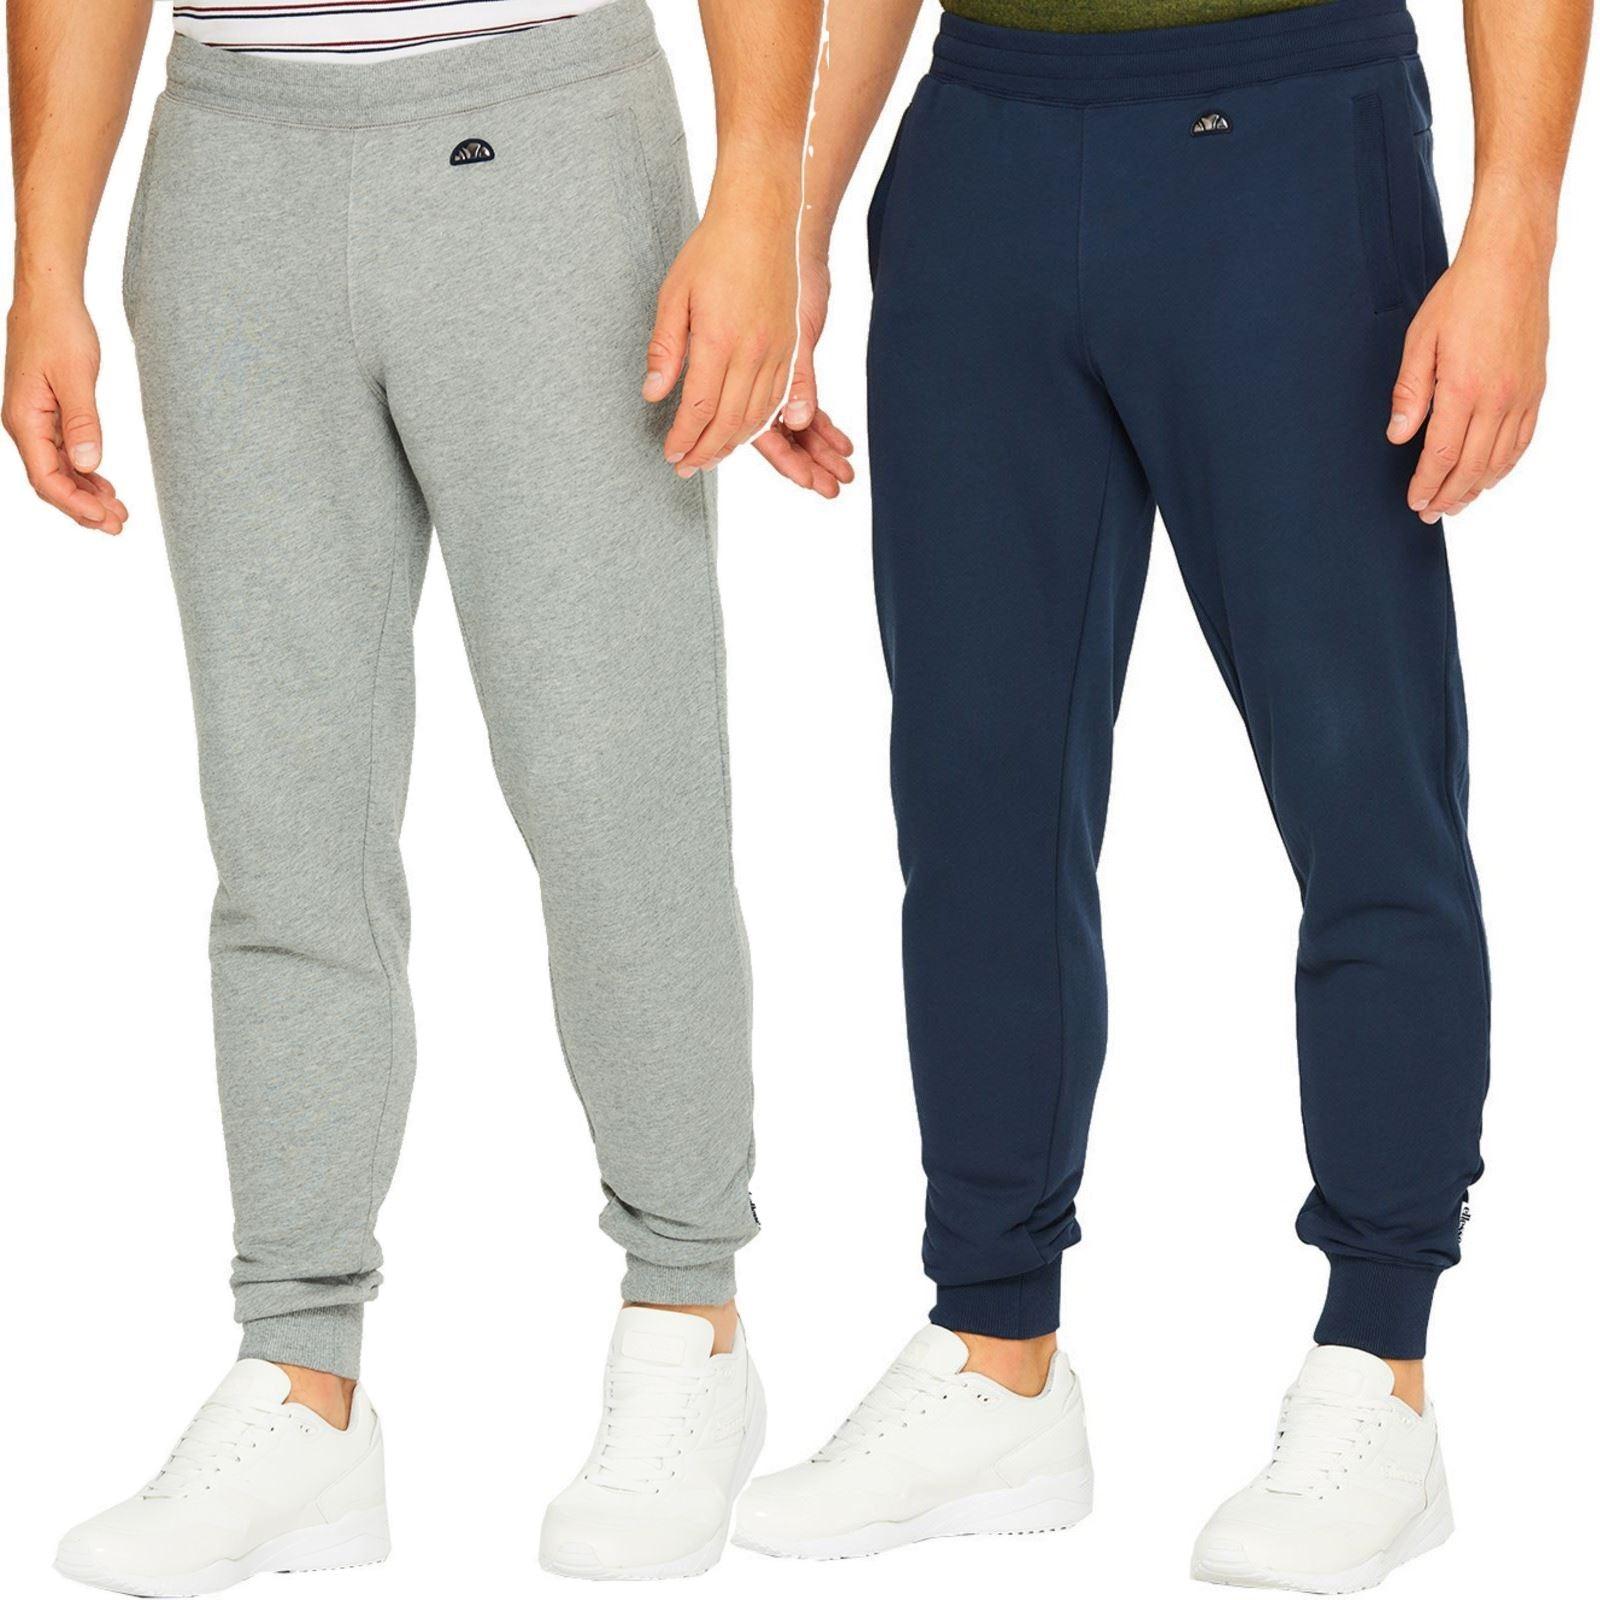 całkowicie stylowy szybka dostawa niska cena Details about Ellesse Maffeo Sweat Pants Jogger Bottoms - Blue, Grey - XS,  S, M, L, XL